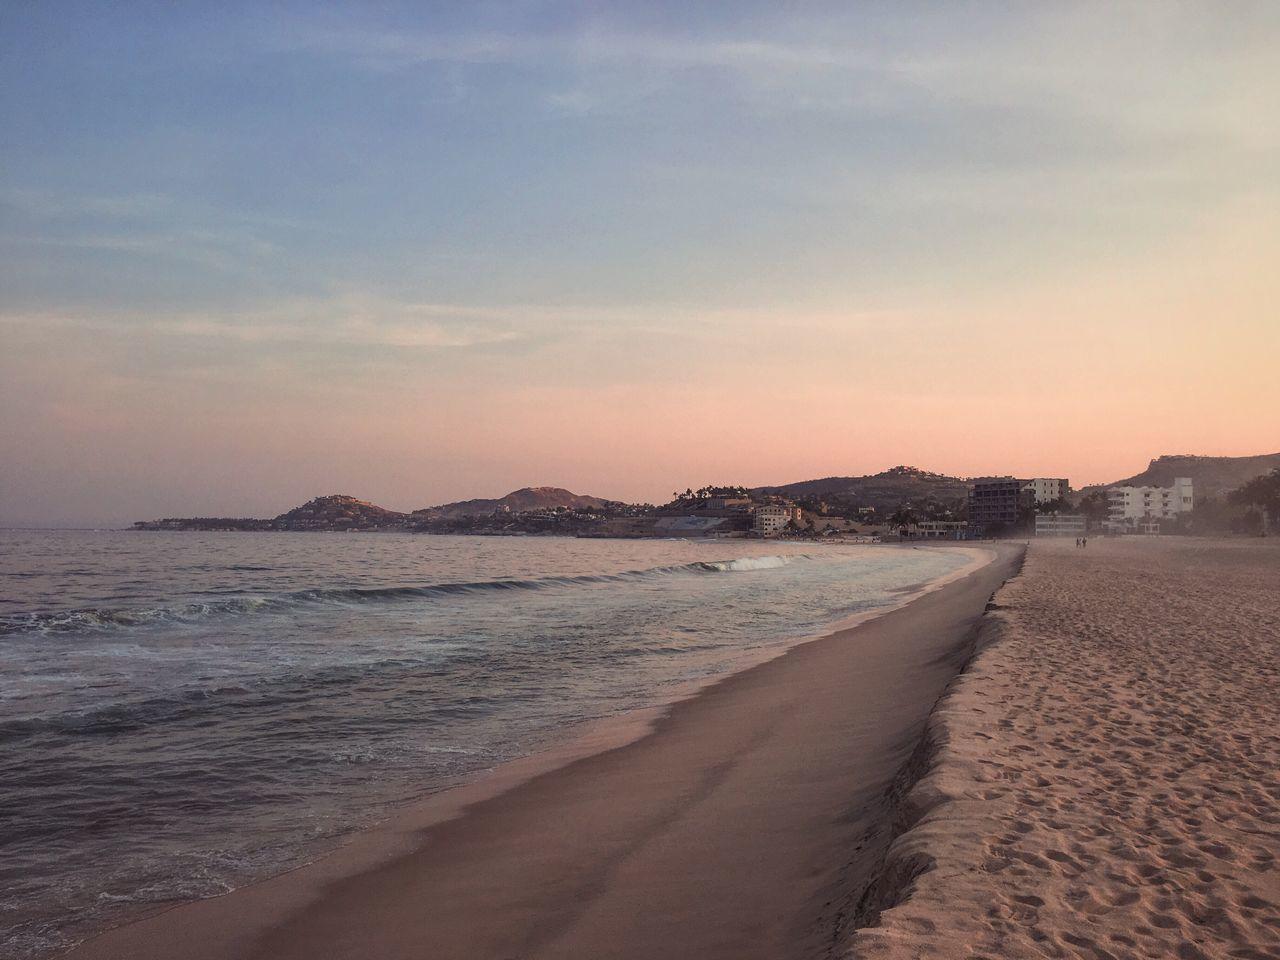 Beach Sunset Sand Sea Nature Scenics Beauty In Nature Water Wave